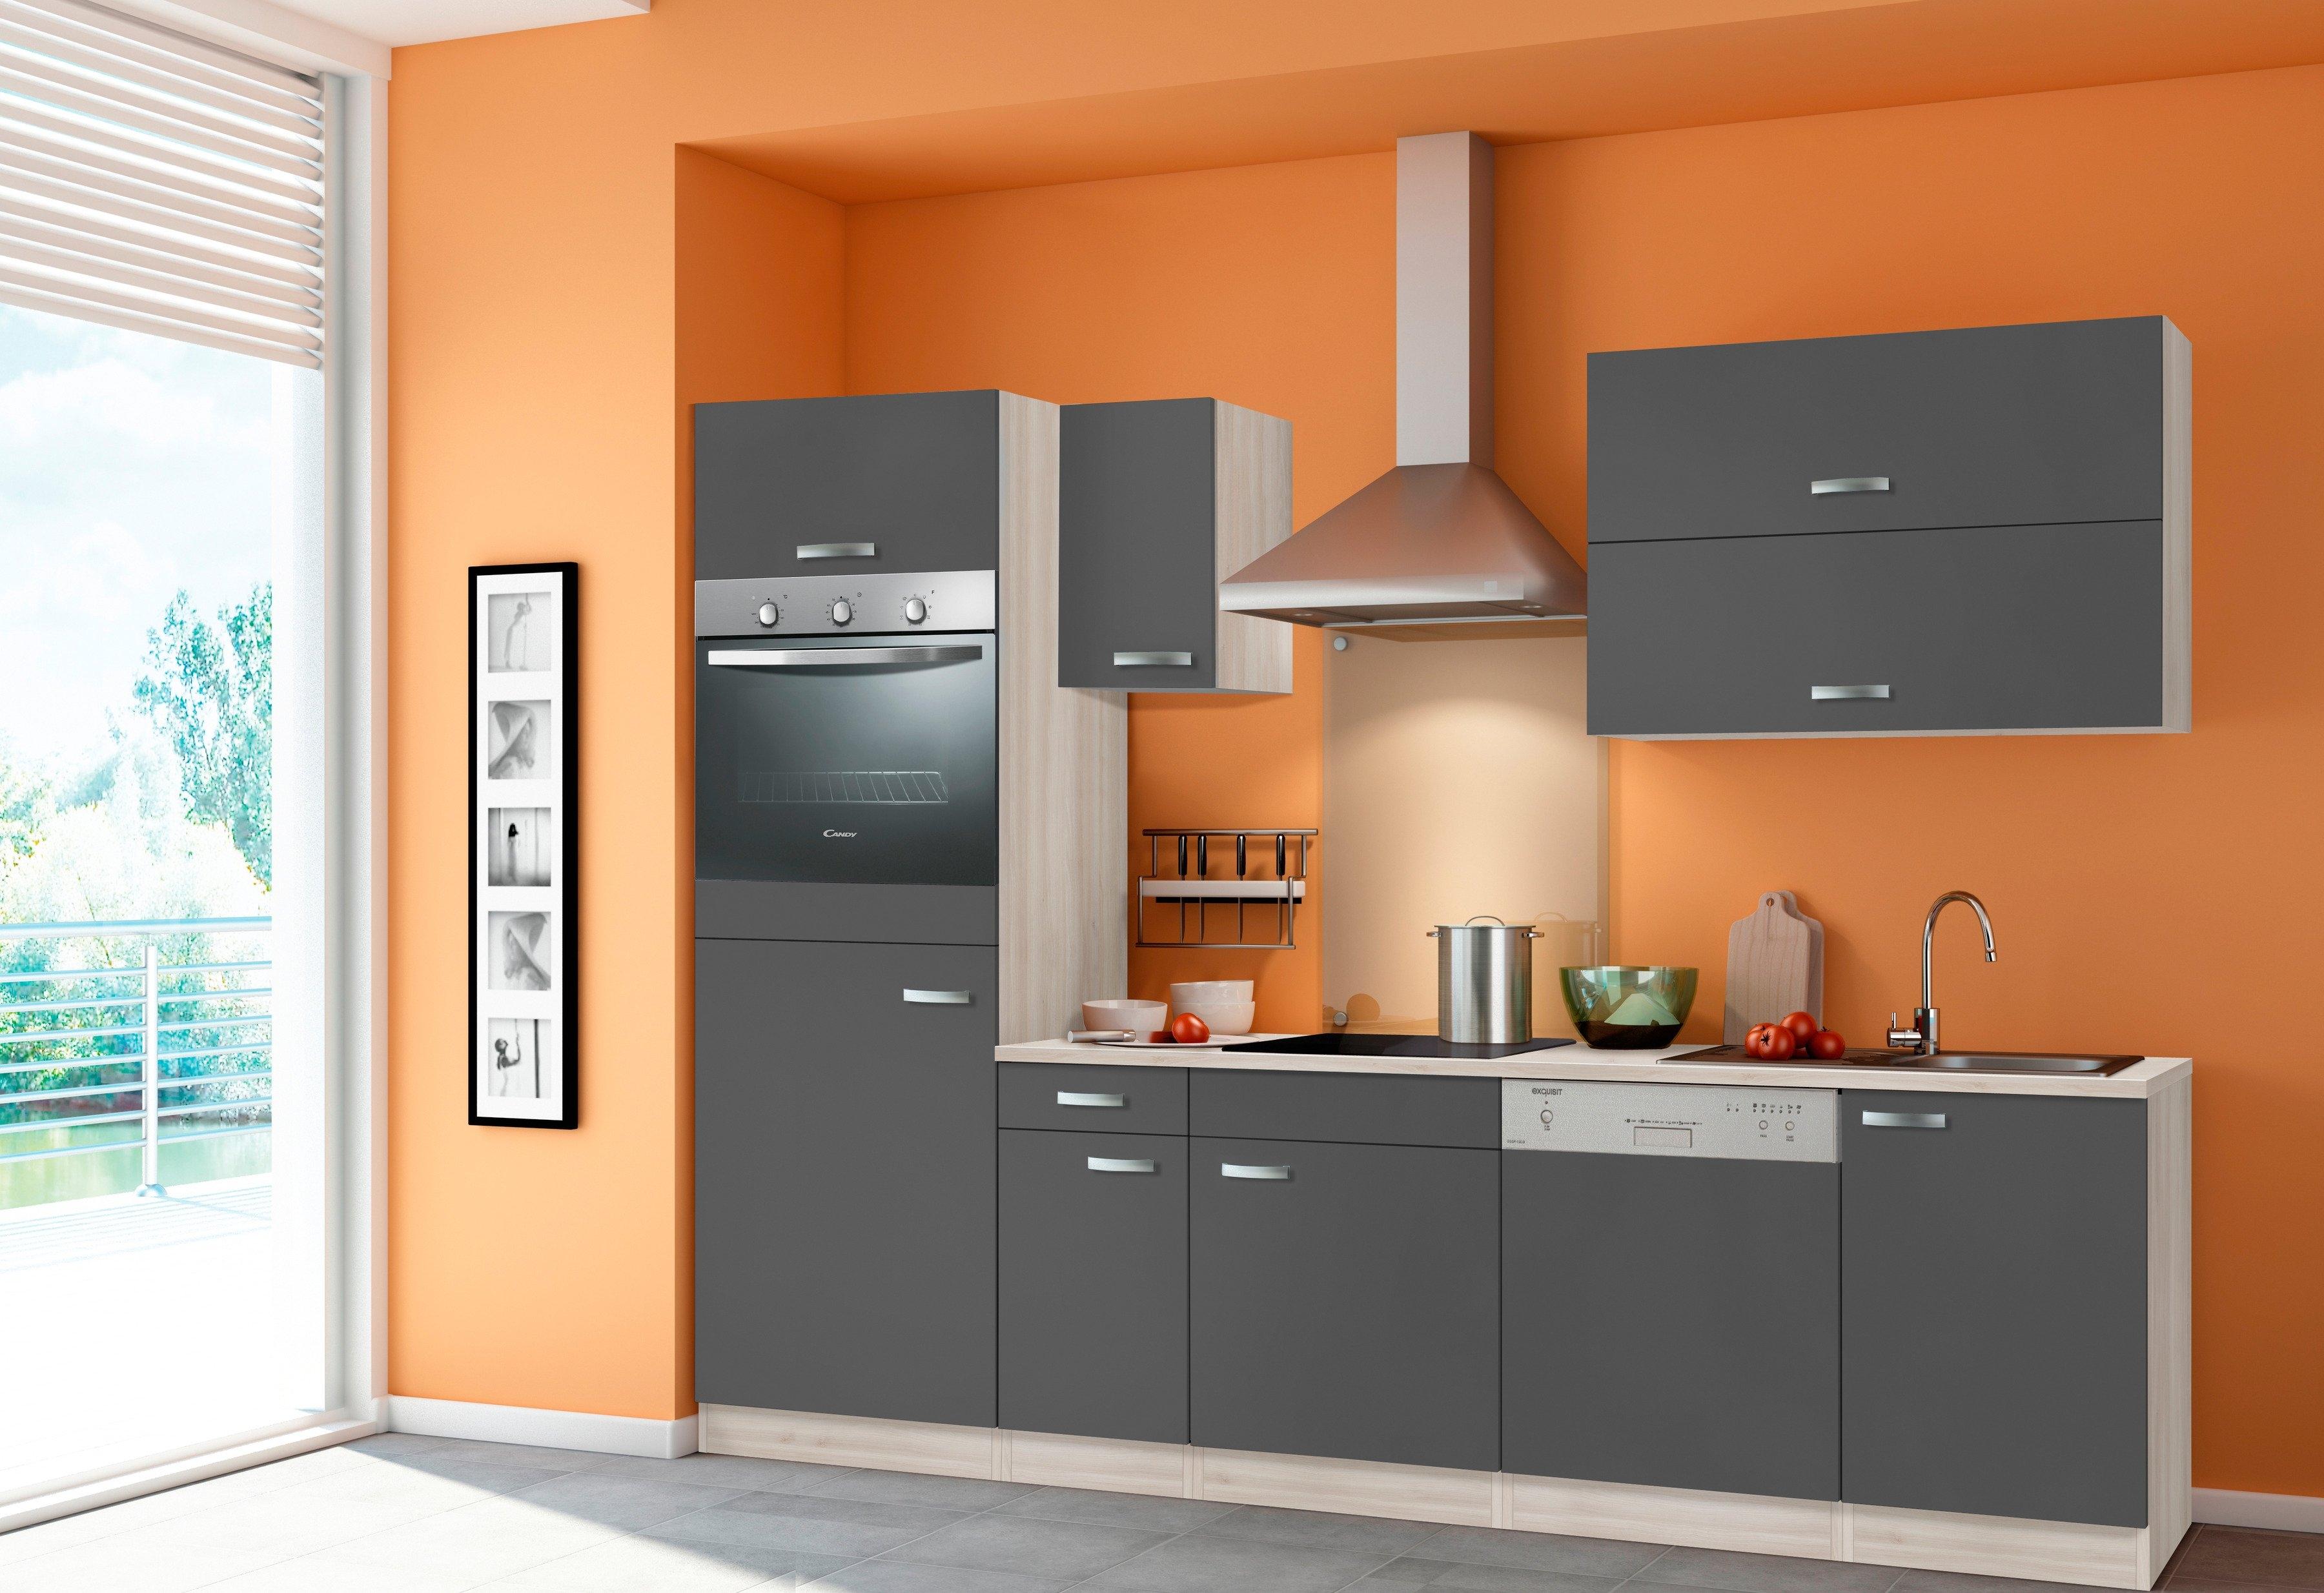 Optifit skagen hoogte cm grijs with optifit keukens for Keuken outlet store